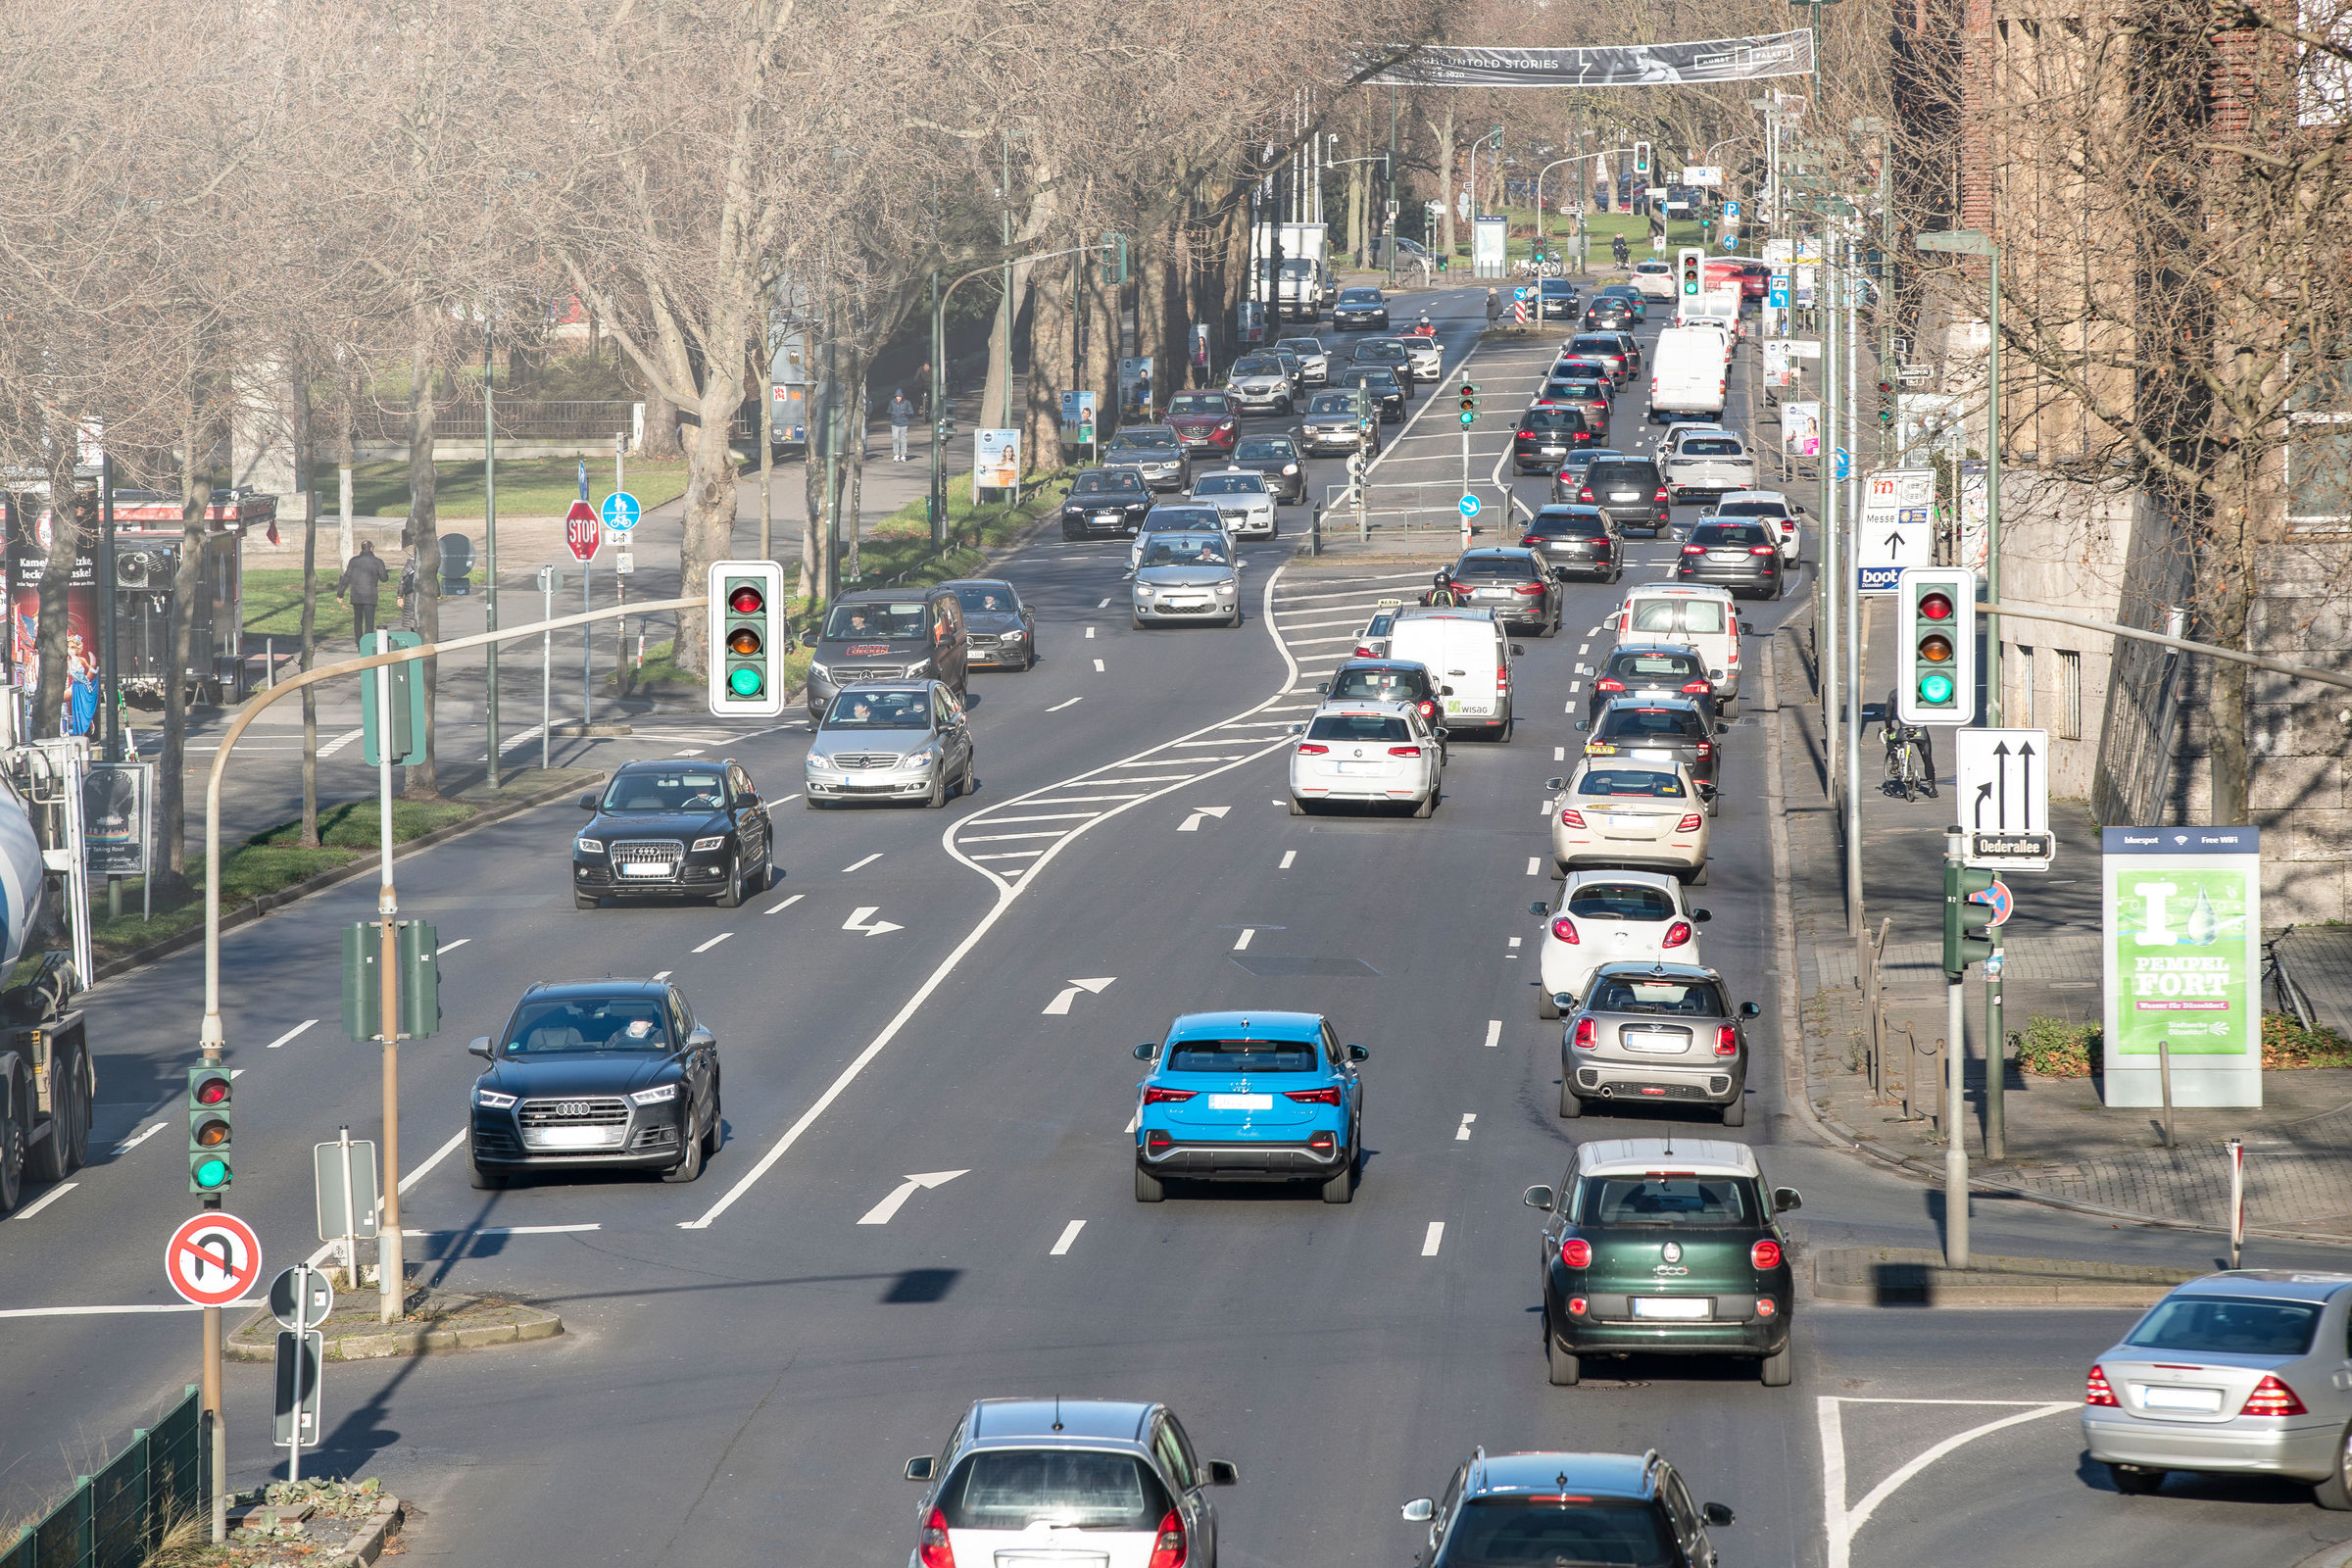 Audi networks with traffic lights in Düsseldorf - Image 5